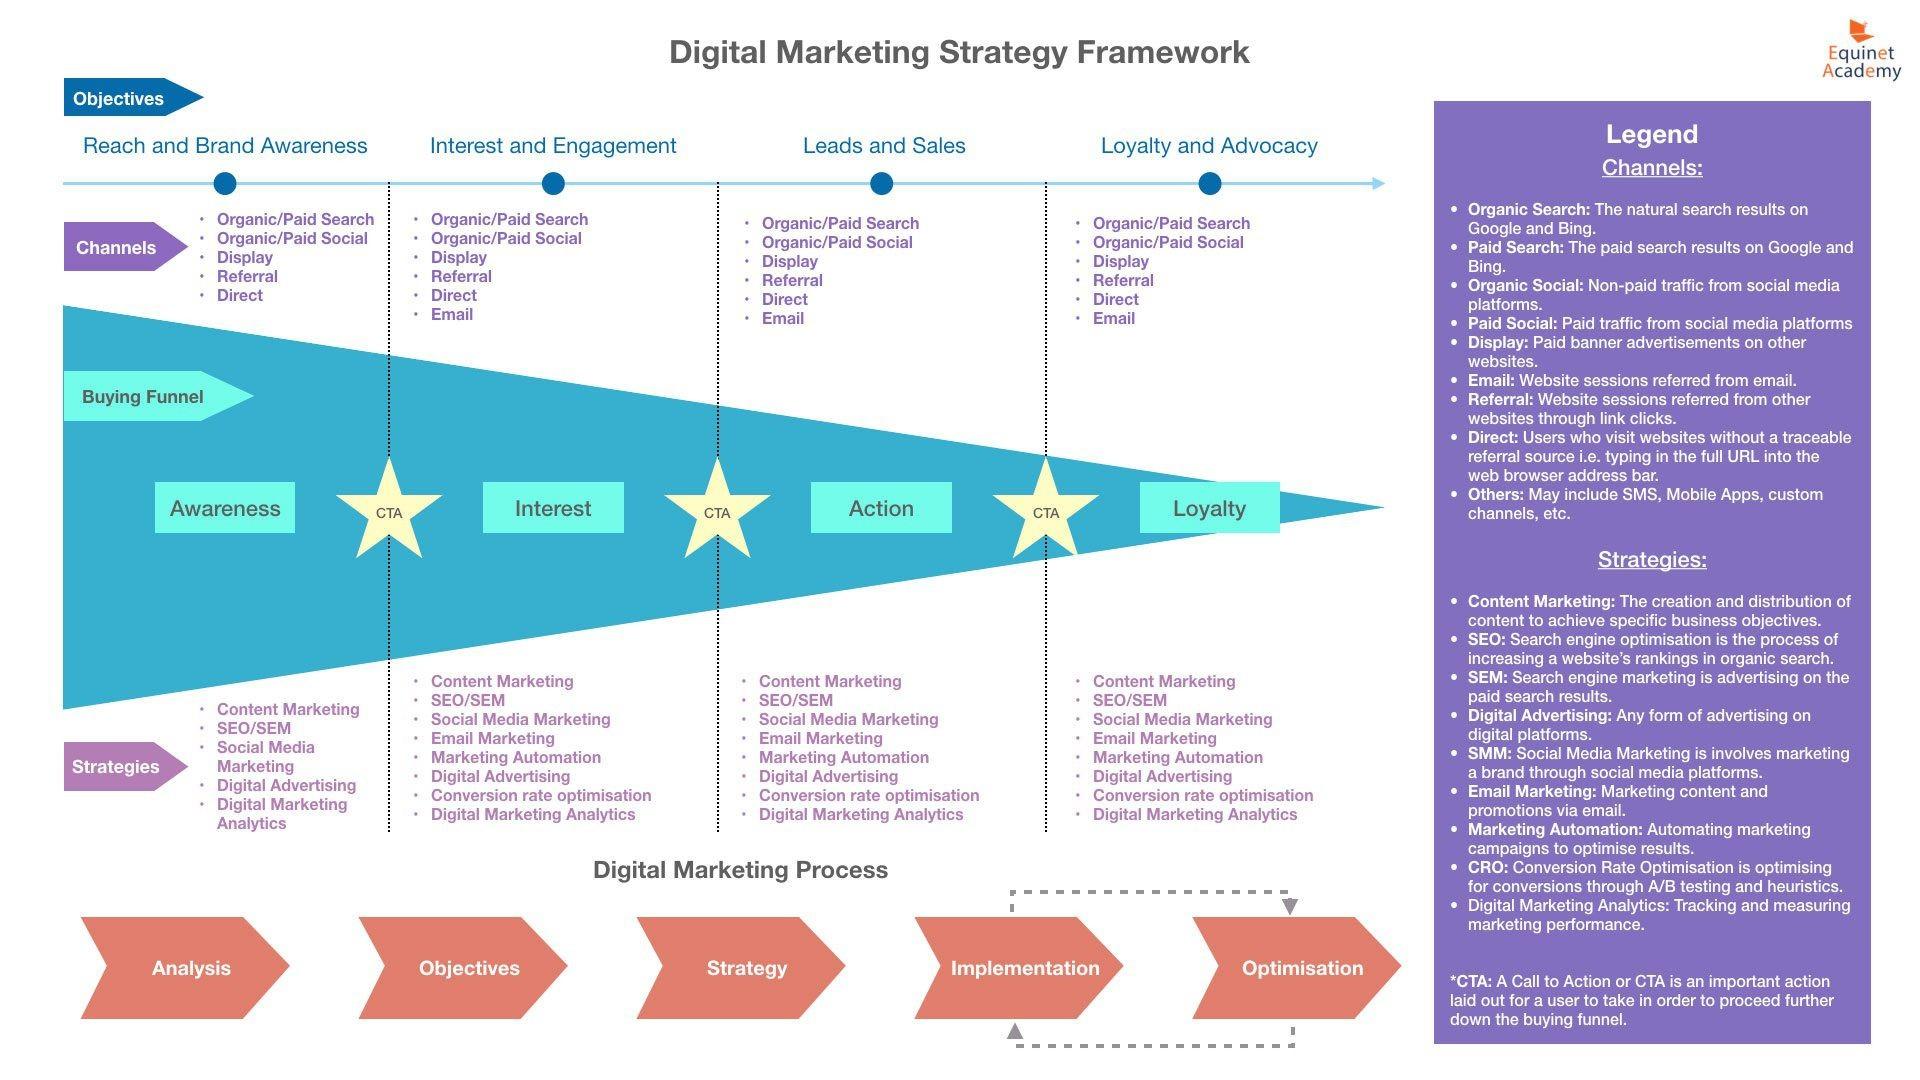 007 Breathtaking Digital Marketing Plan Example Pdf Sample  Free Template Busines1920